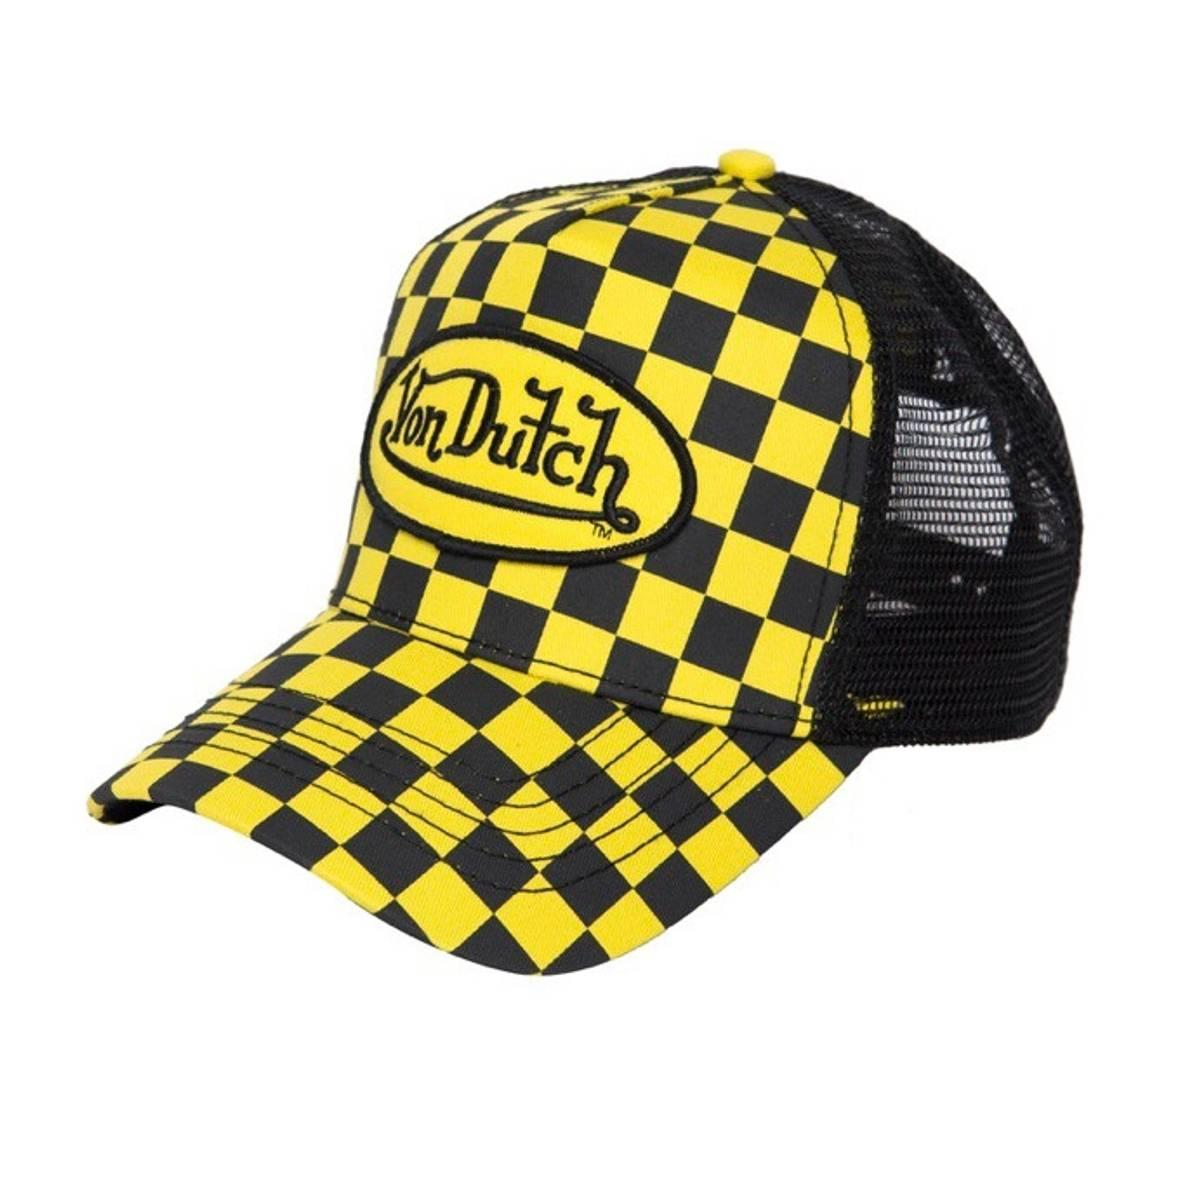 Von Dutch Von Dutch Trucker Hat Cap 237 S P Yellow Black Checker Supreme  Box Logo Playboi Carti Ian Connor Awge Rocky Size one size - Hats for Sale  - ... 52f20f261408